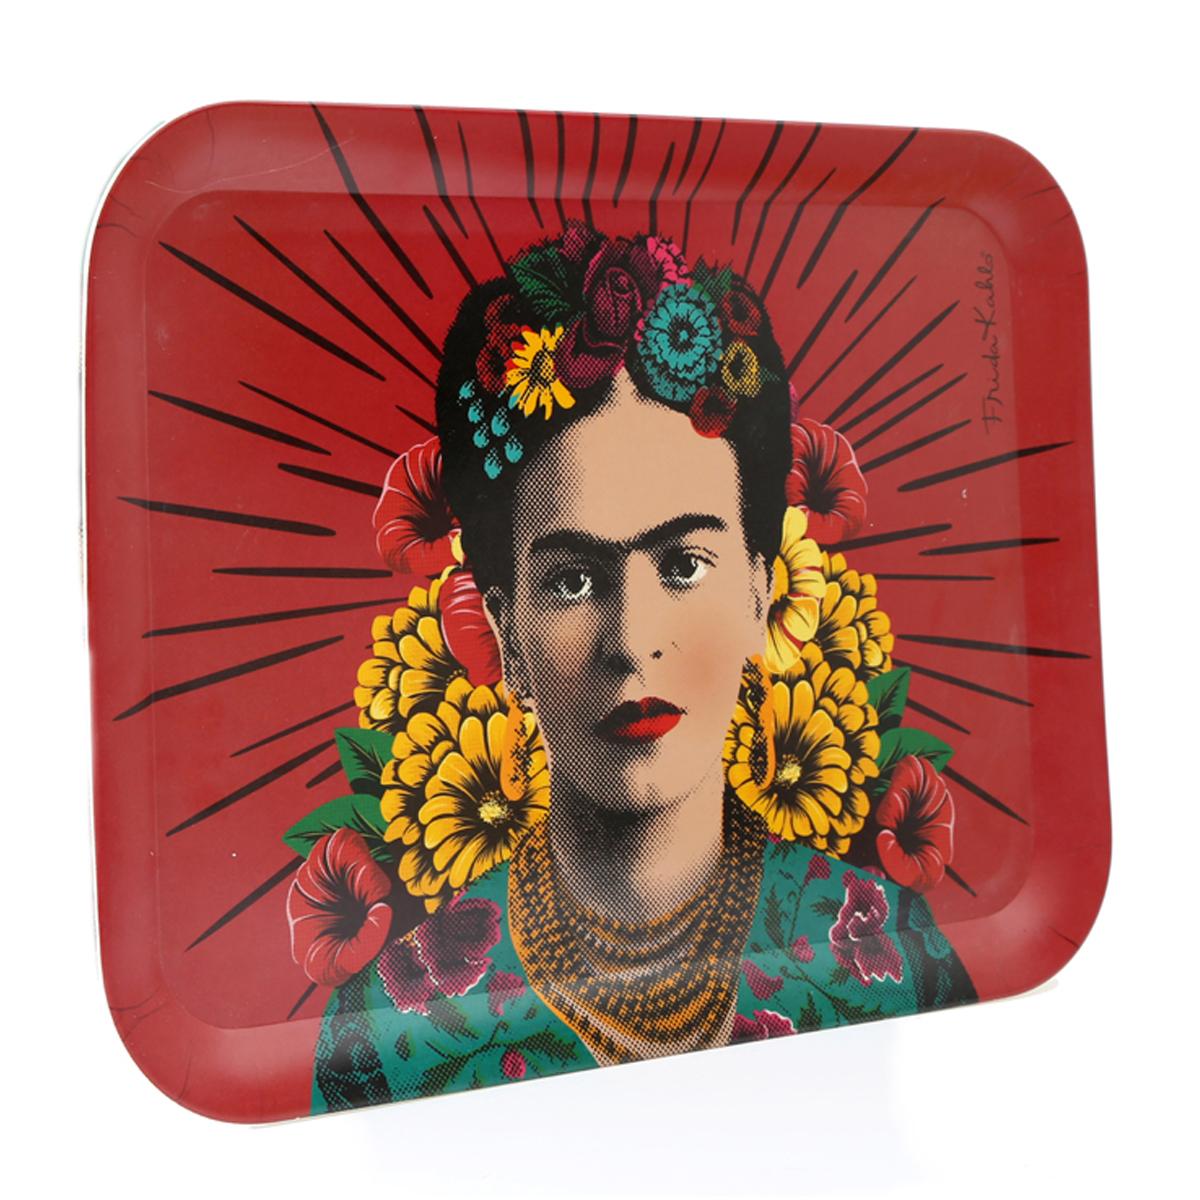 Grand plateau bambou \'Frida Kahlo\' rose - 43x32 cm - [A1403]